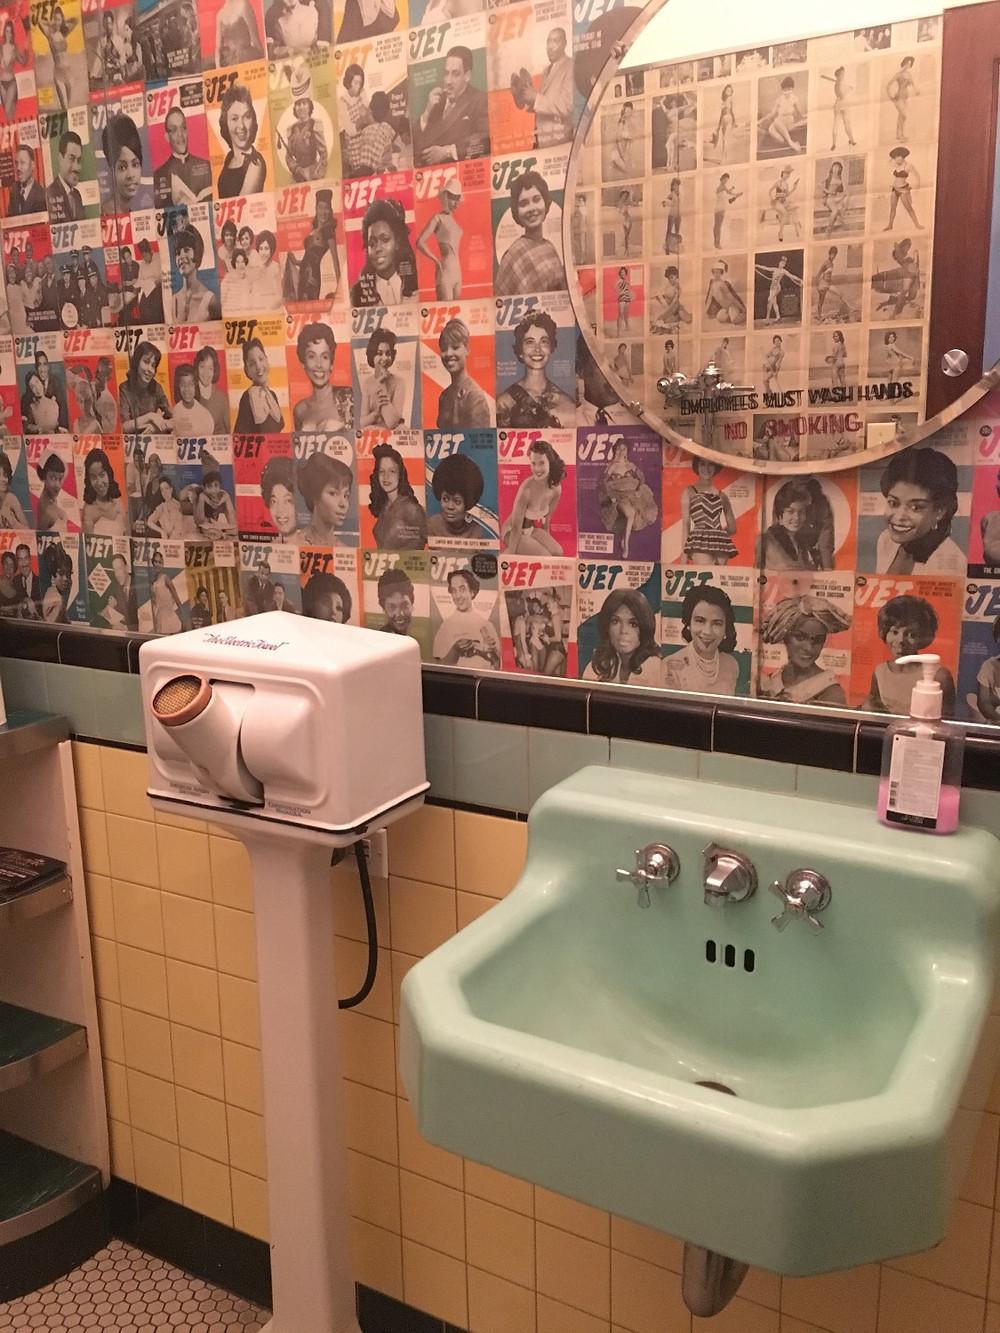 Harlem Shake bathroom with Jet magazine covers